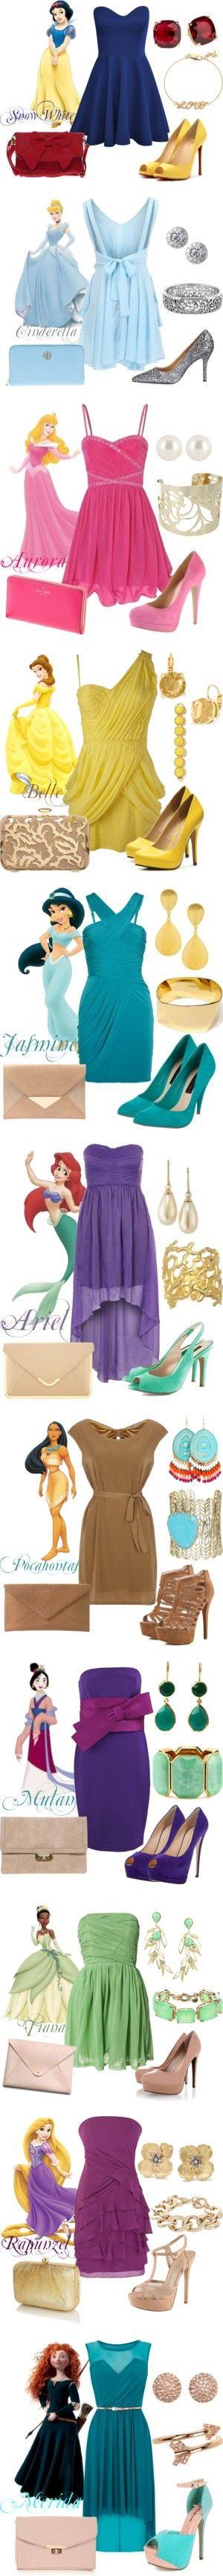 """Disney Princess Dress Outfits"""